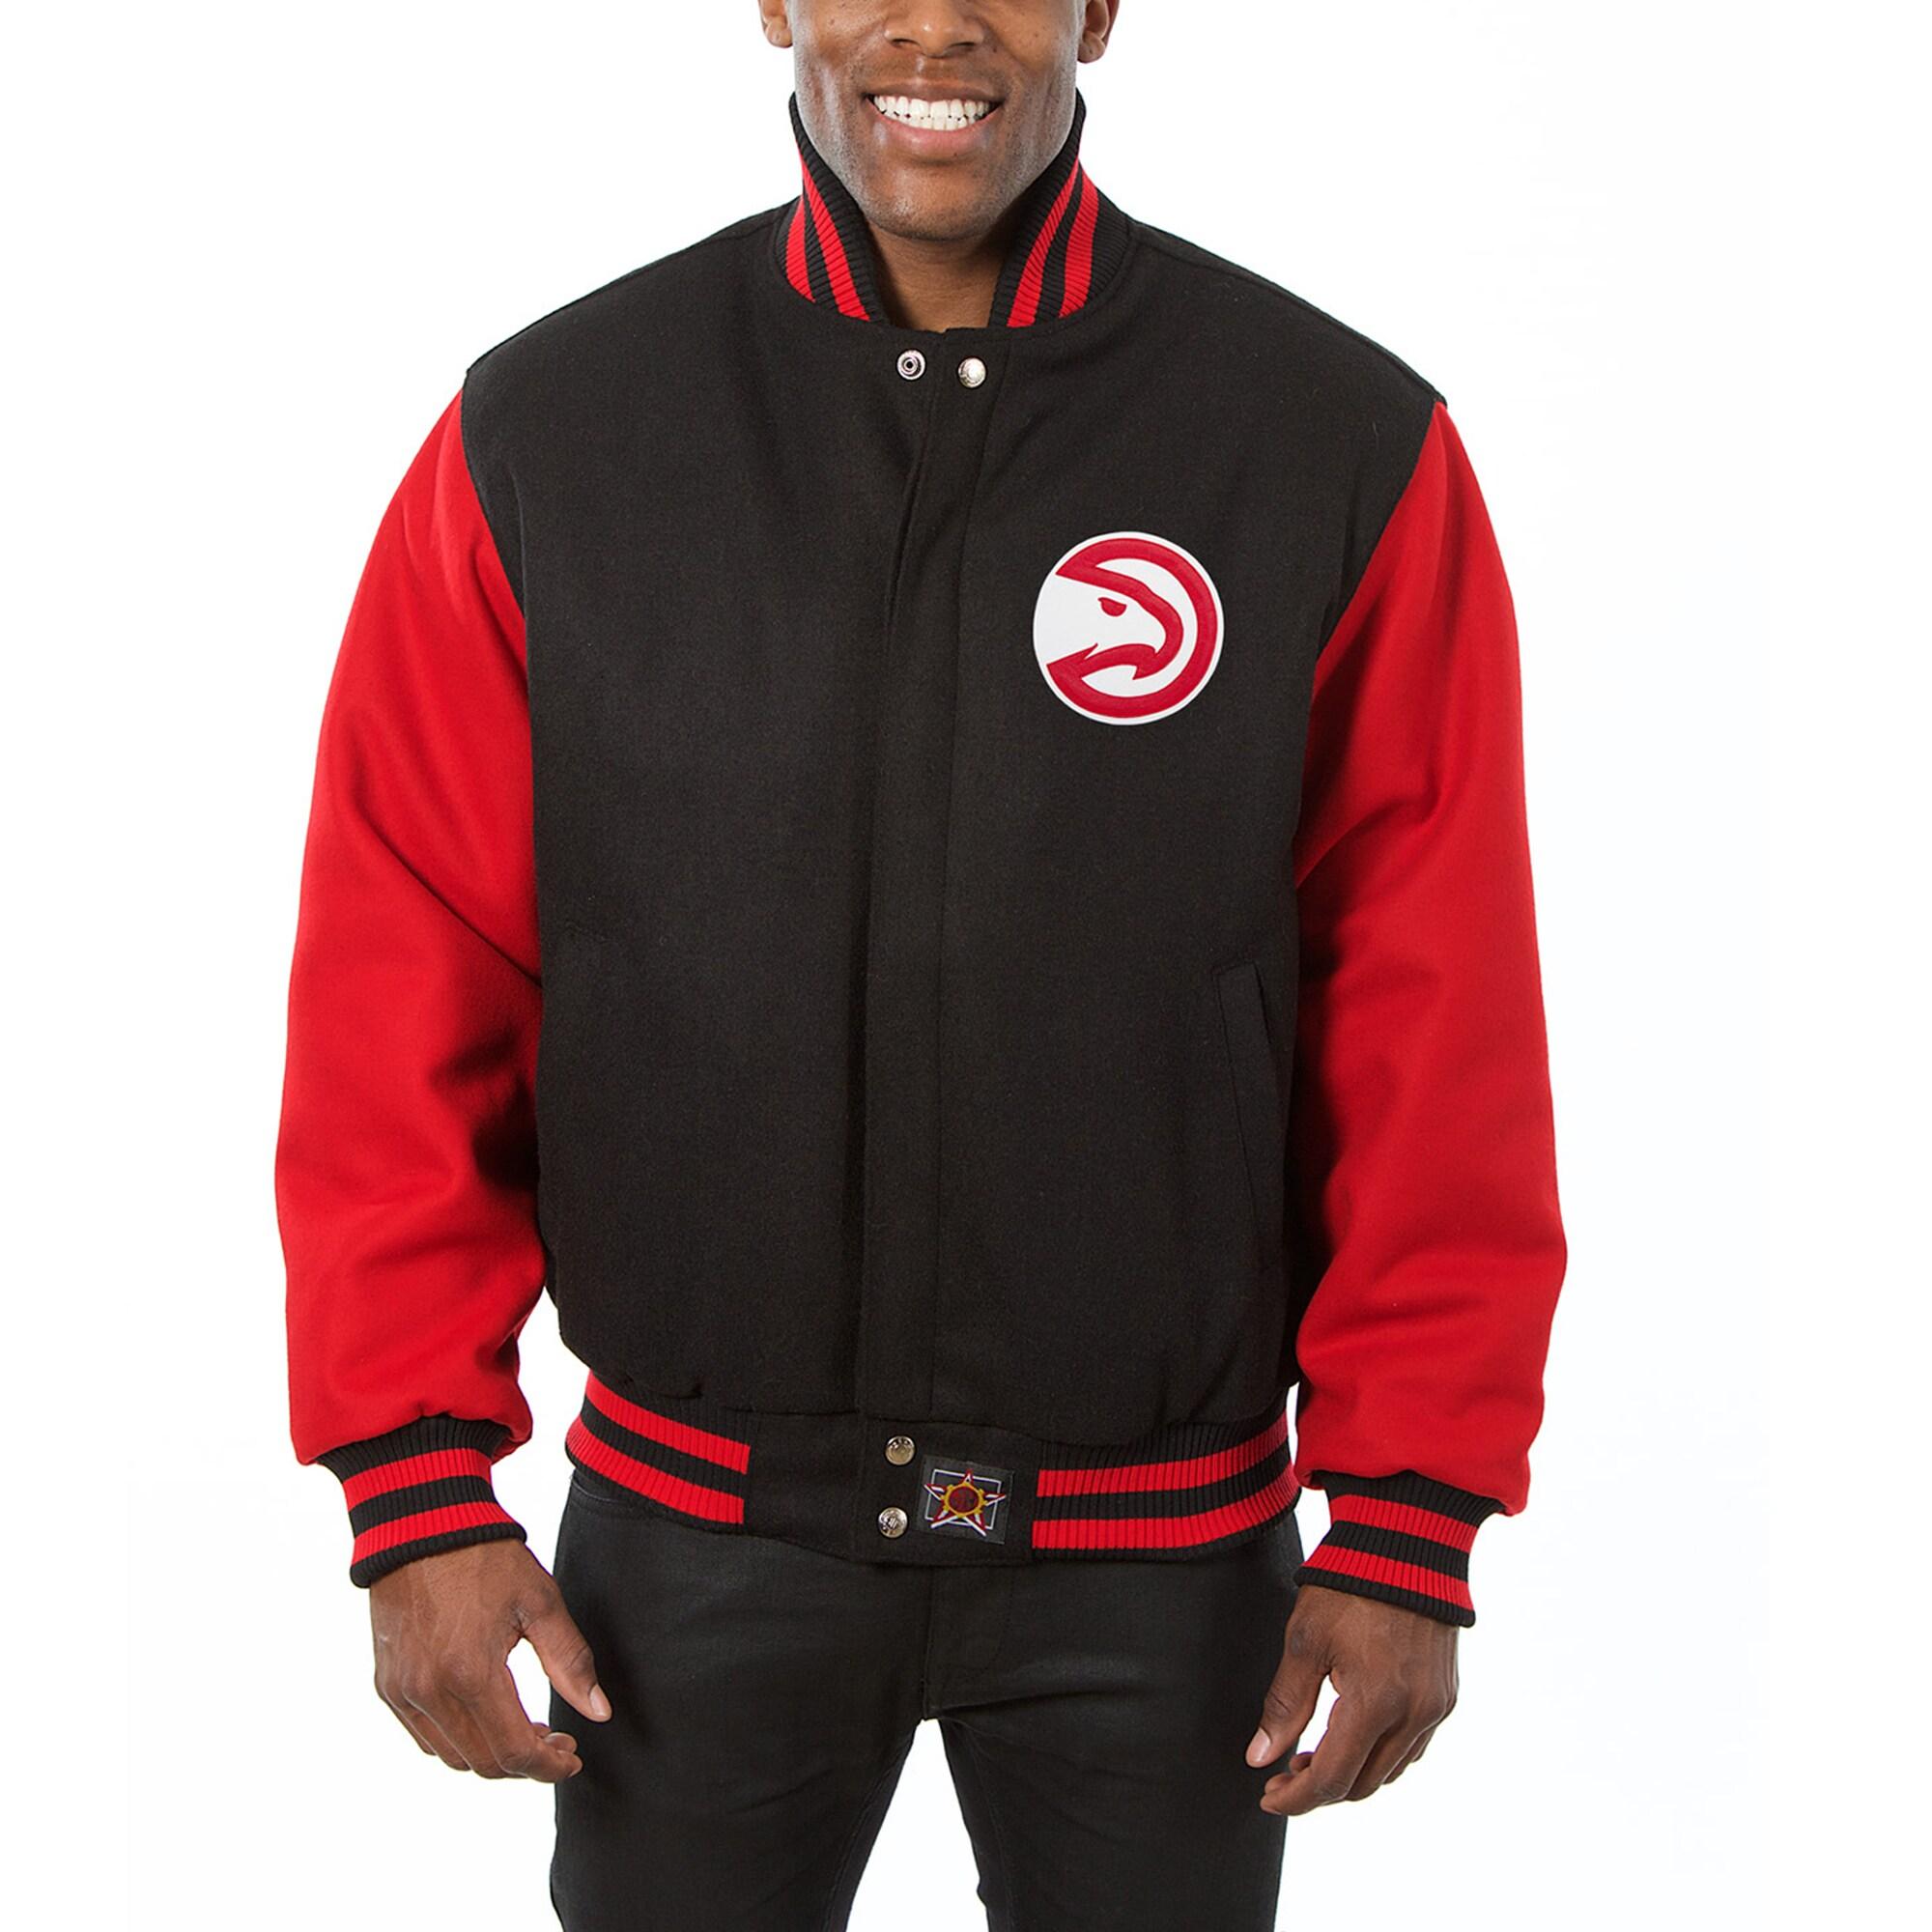 Atlanta Hawks JH Design Big & Tall All Wool Jacket with Leather Logo - Black/Red